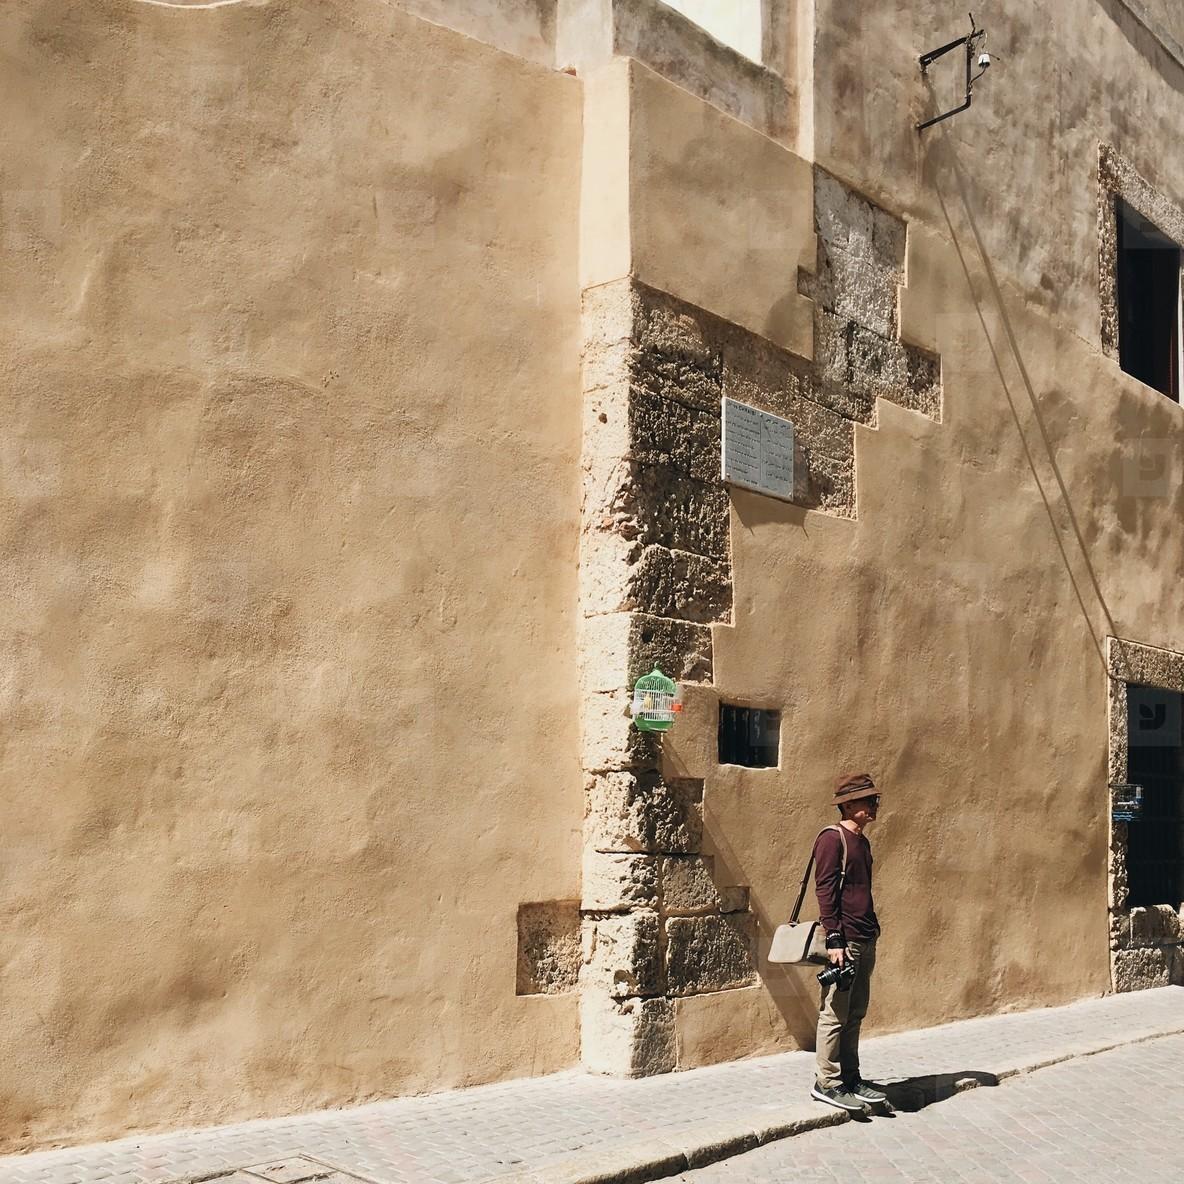 Building in Morocco  06